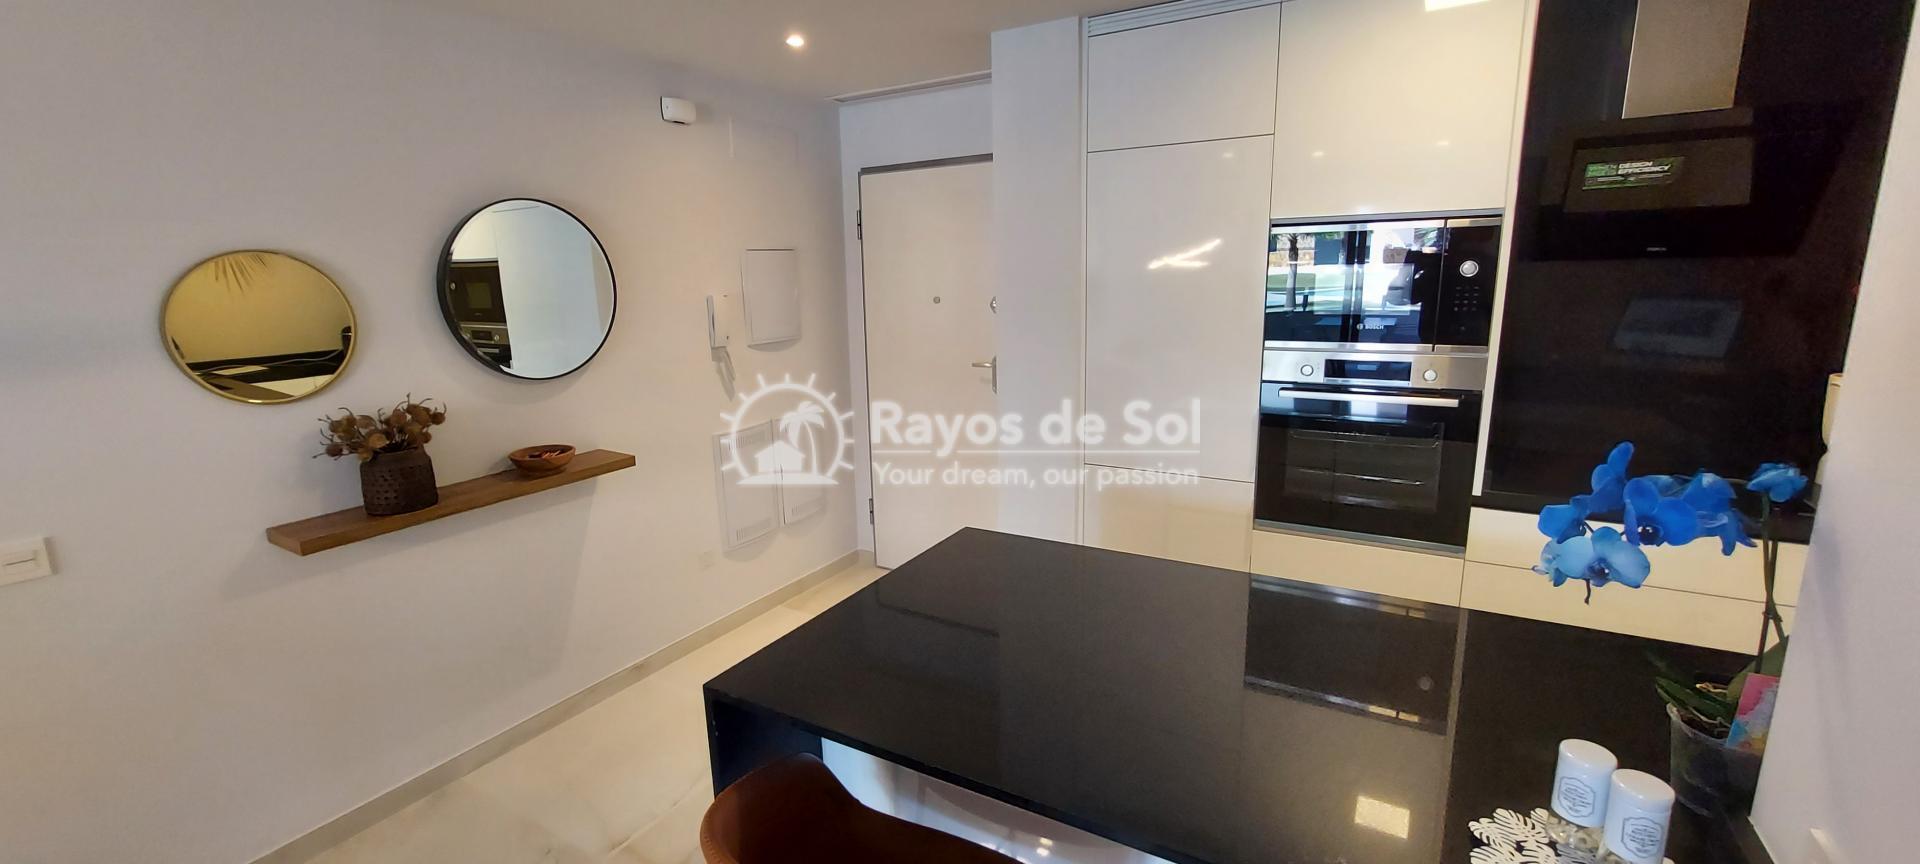 Apartment ground floor  in Orihuela Costa, Costa Blanca (amanecer6-gf-3d) - 5